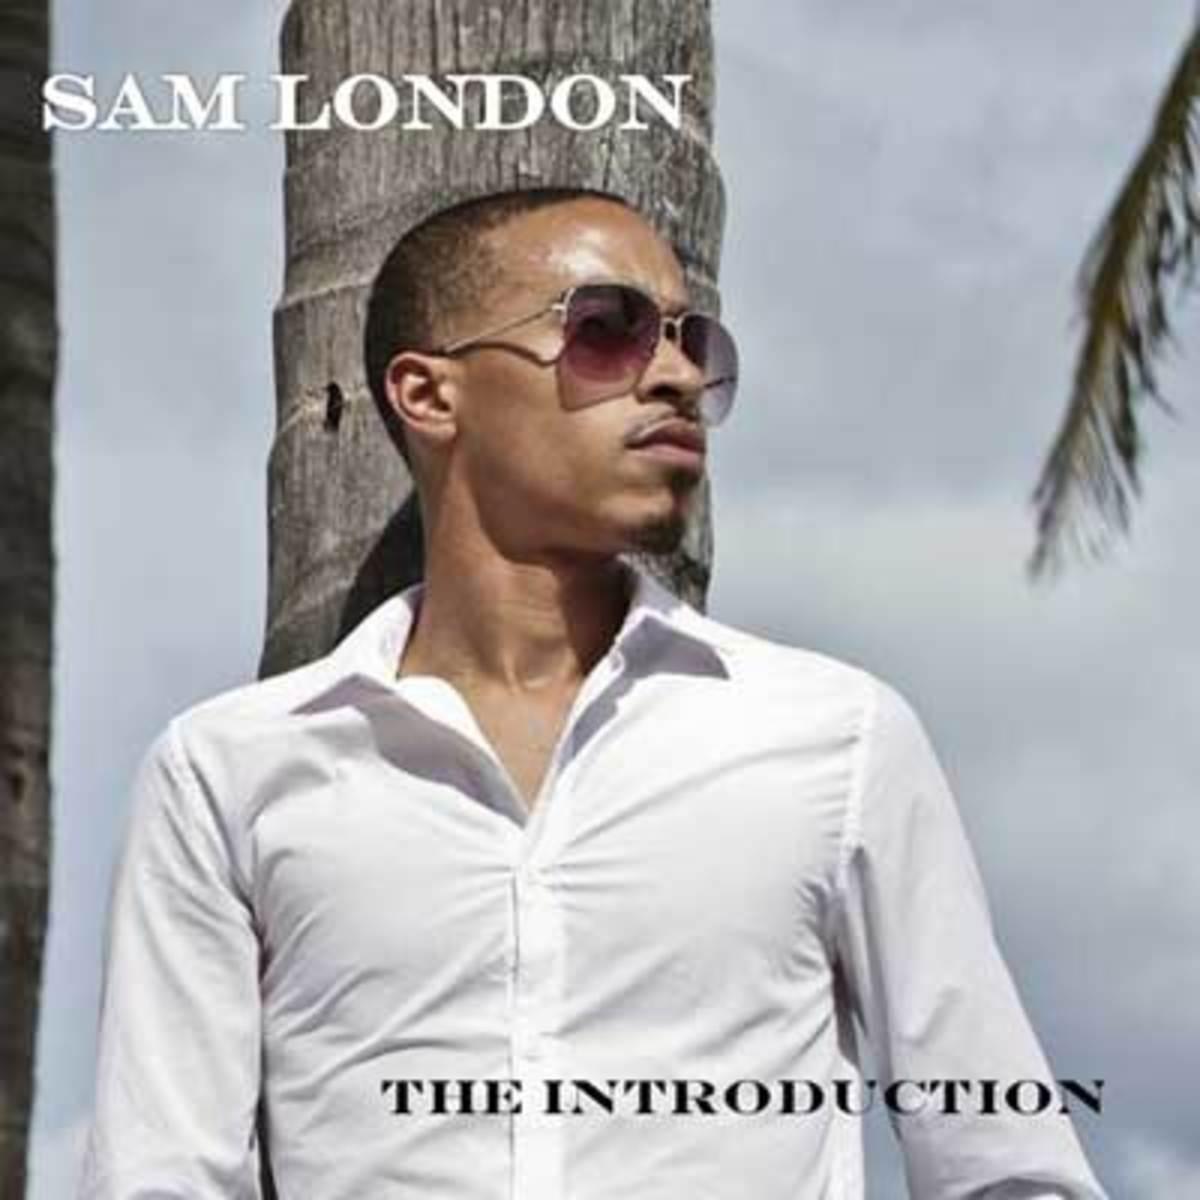 samlondon-theintroduction.jpg